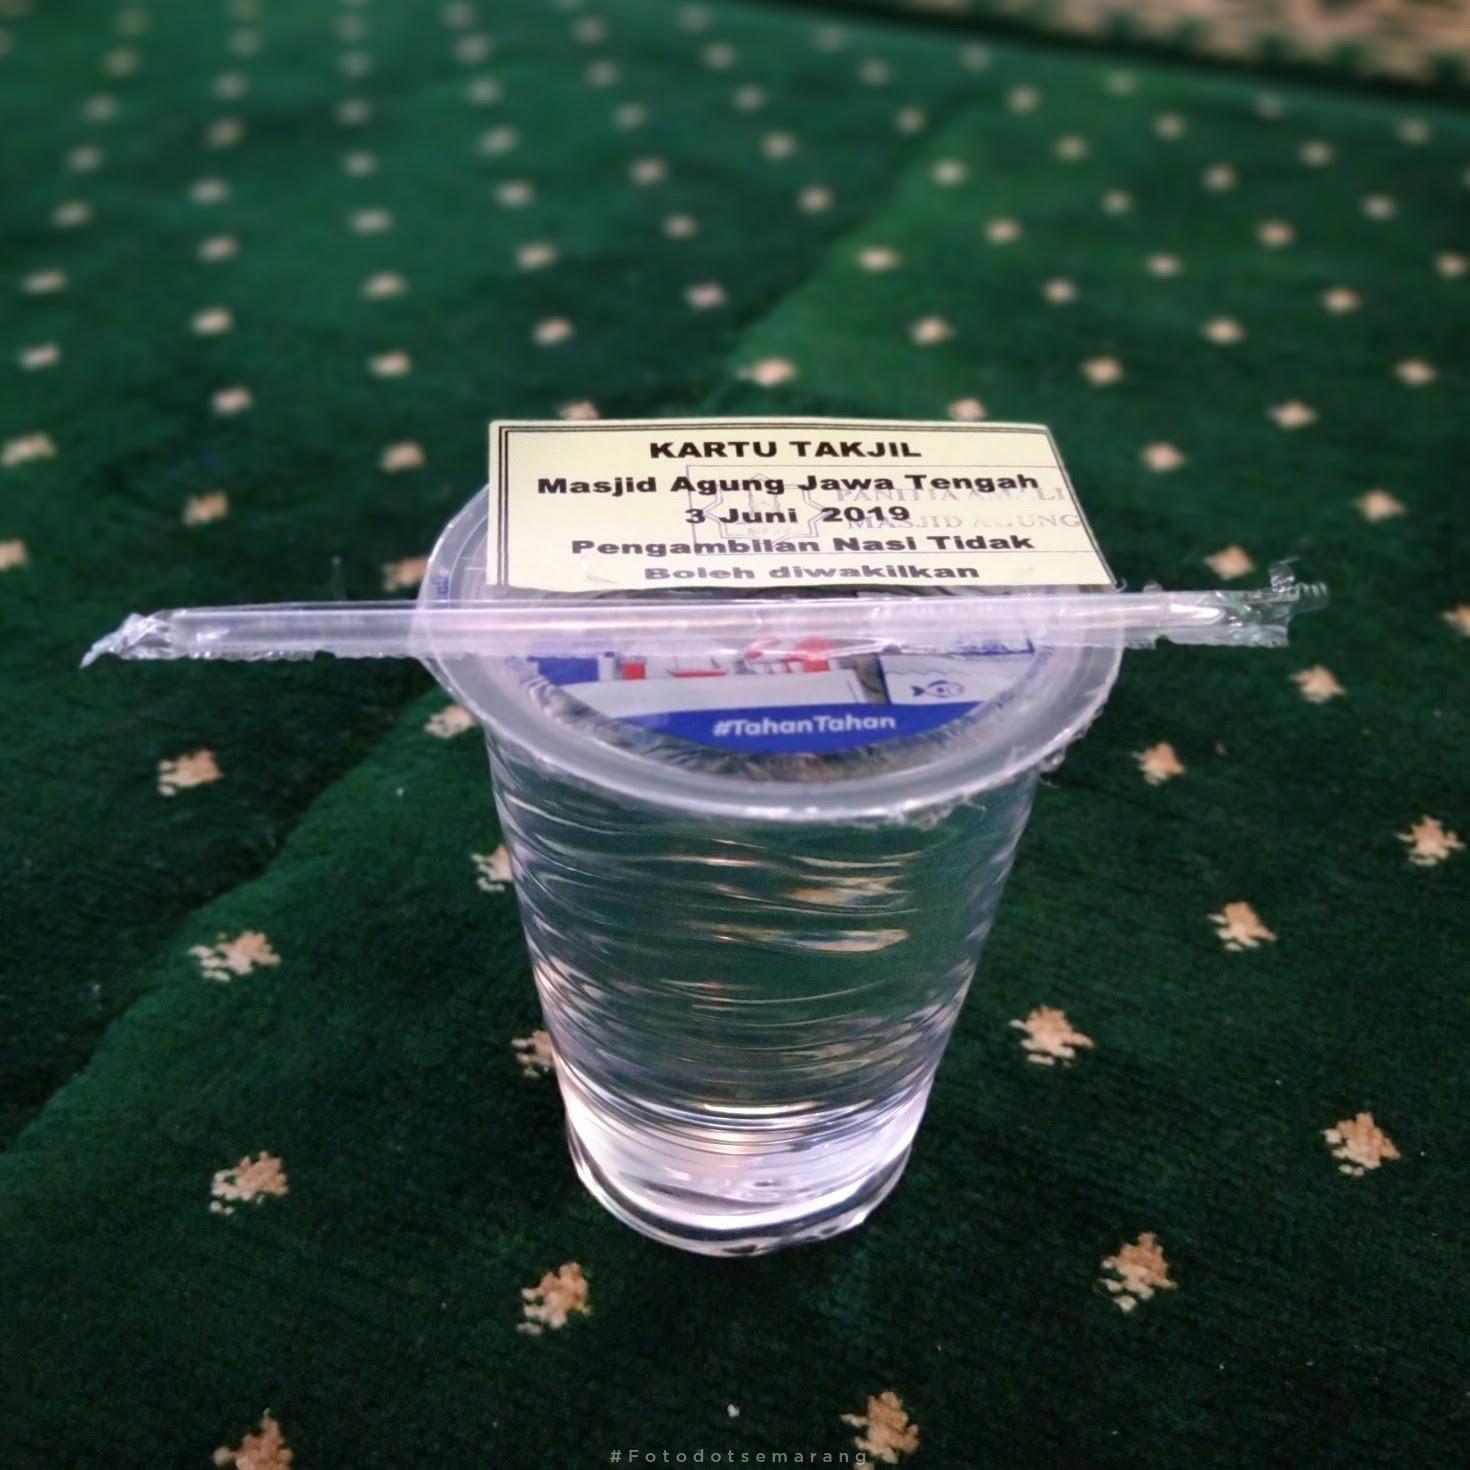 Buka Puasa di Masjid Agung Jawa Tengah, Jangan Lupa Ambil Kupon Dulu